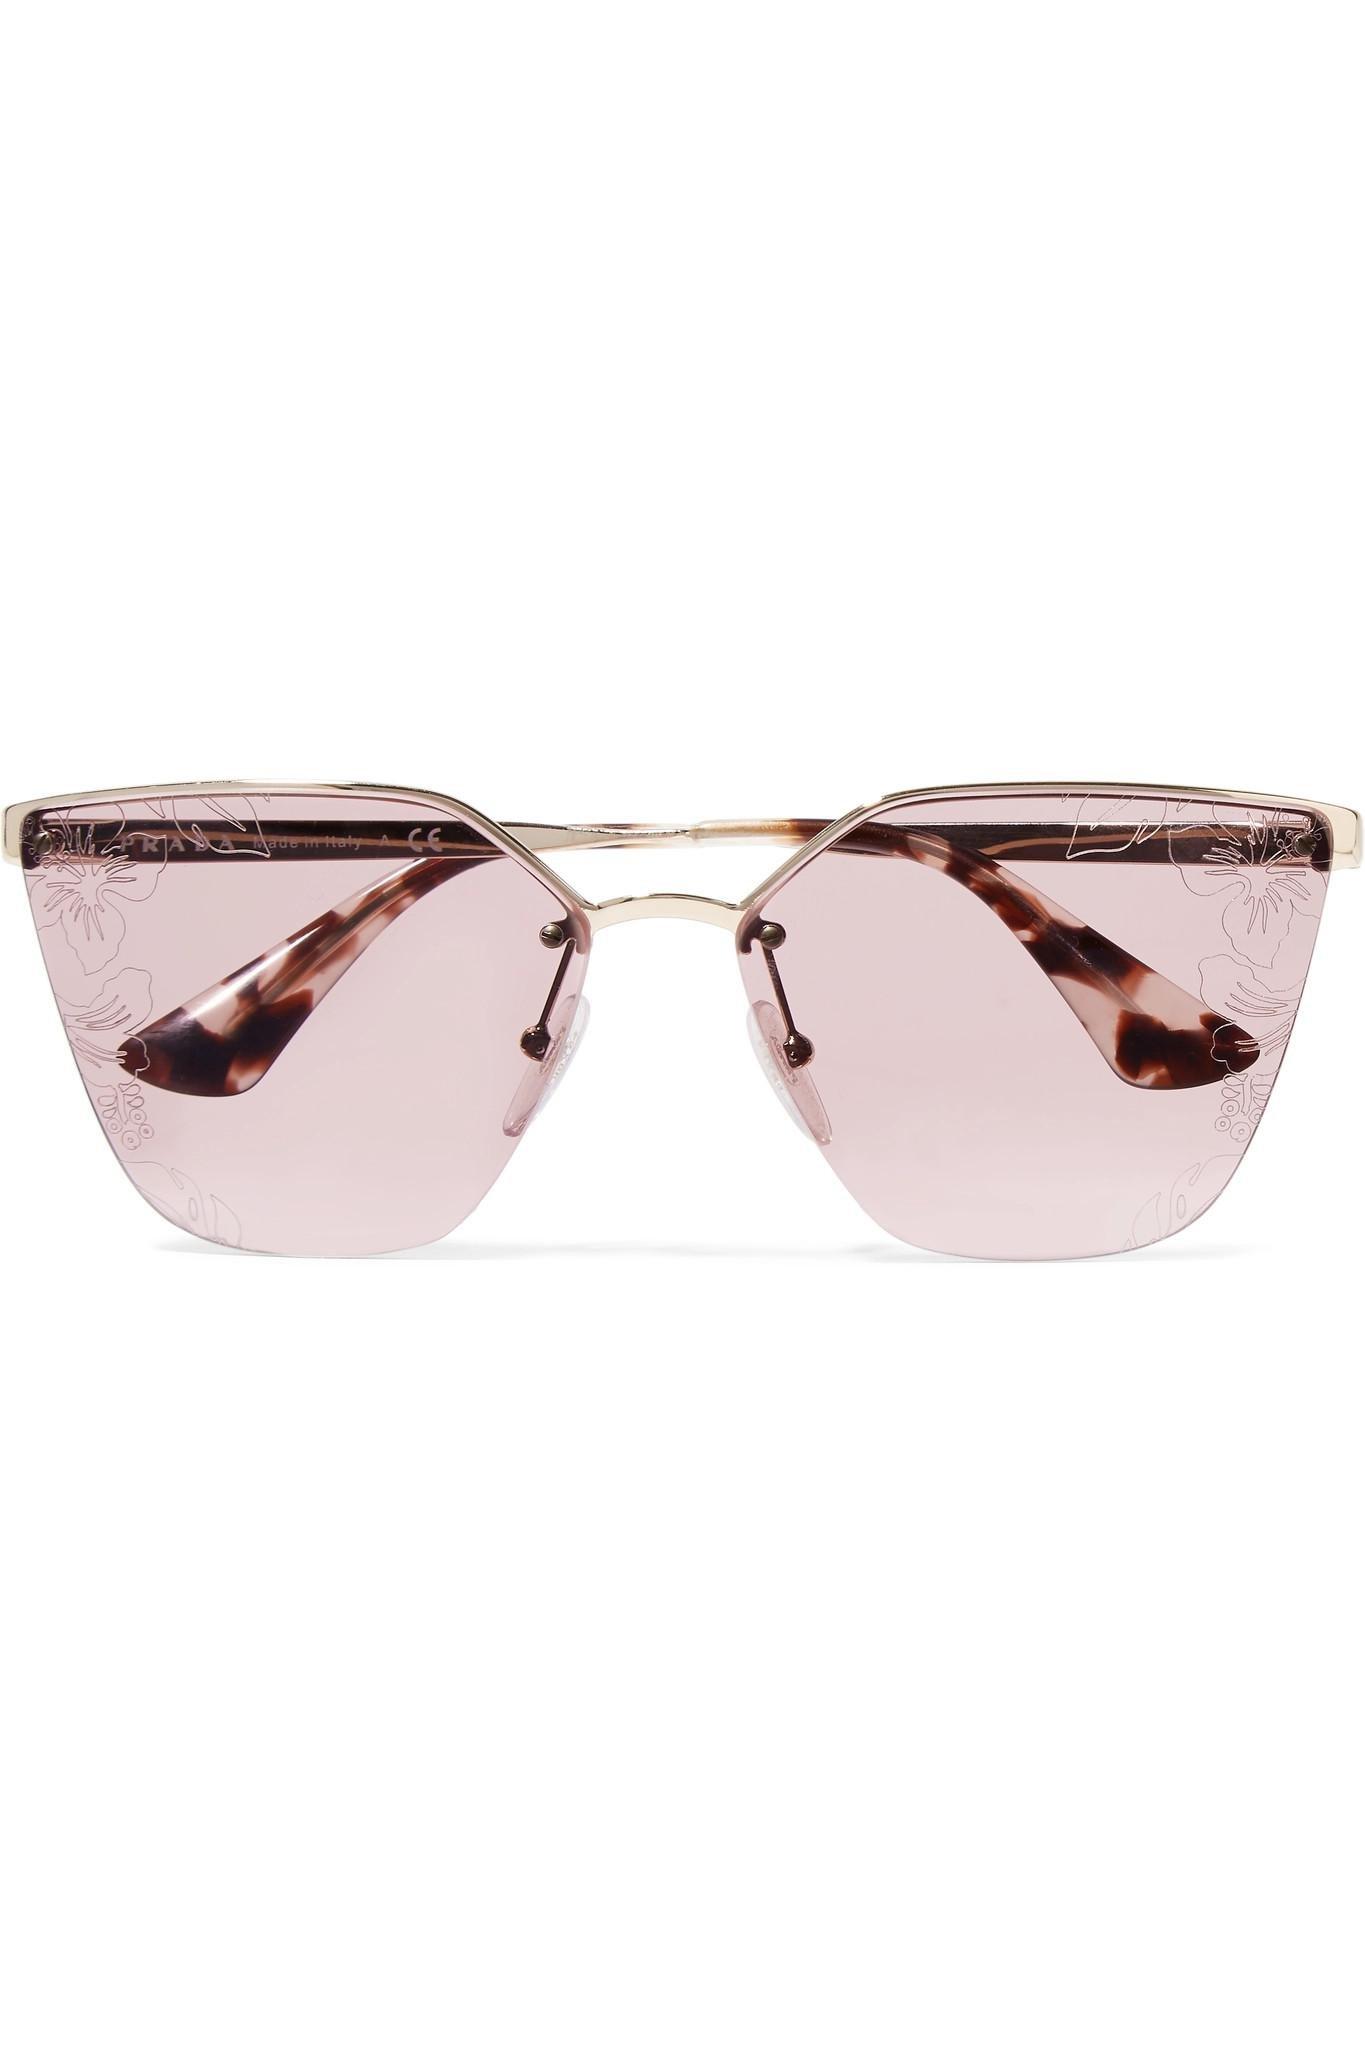 84151221e81b ... italy prada. womens metallic cat eye acetate and silver tone sunglasses  44b54 9c317 ...